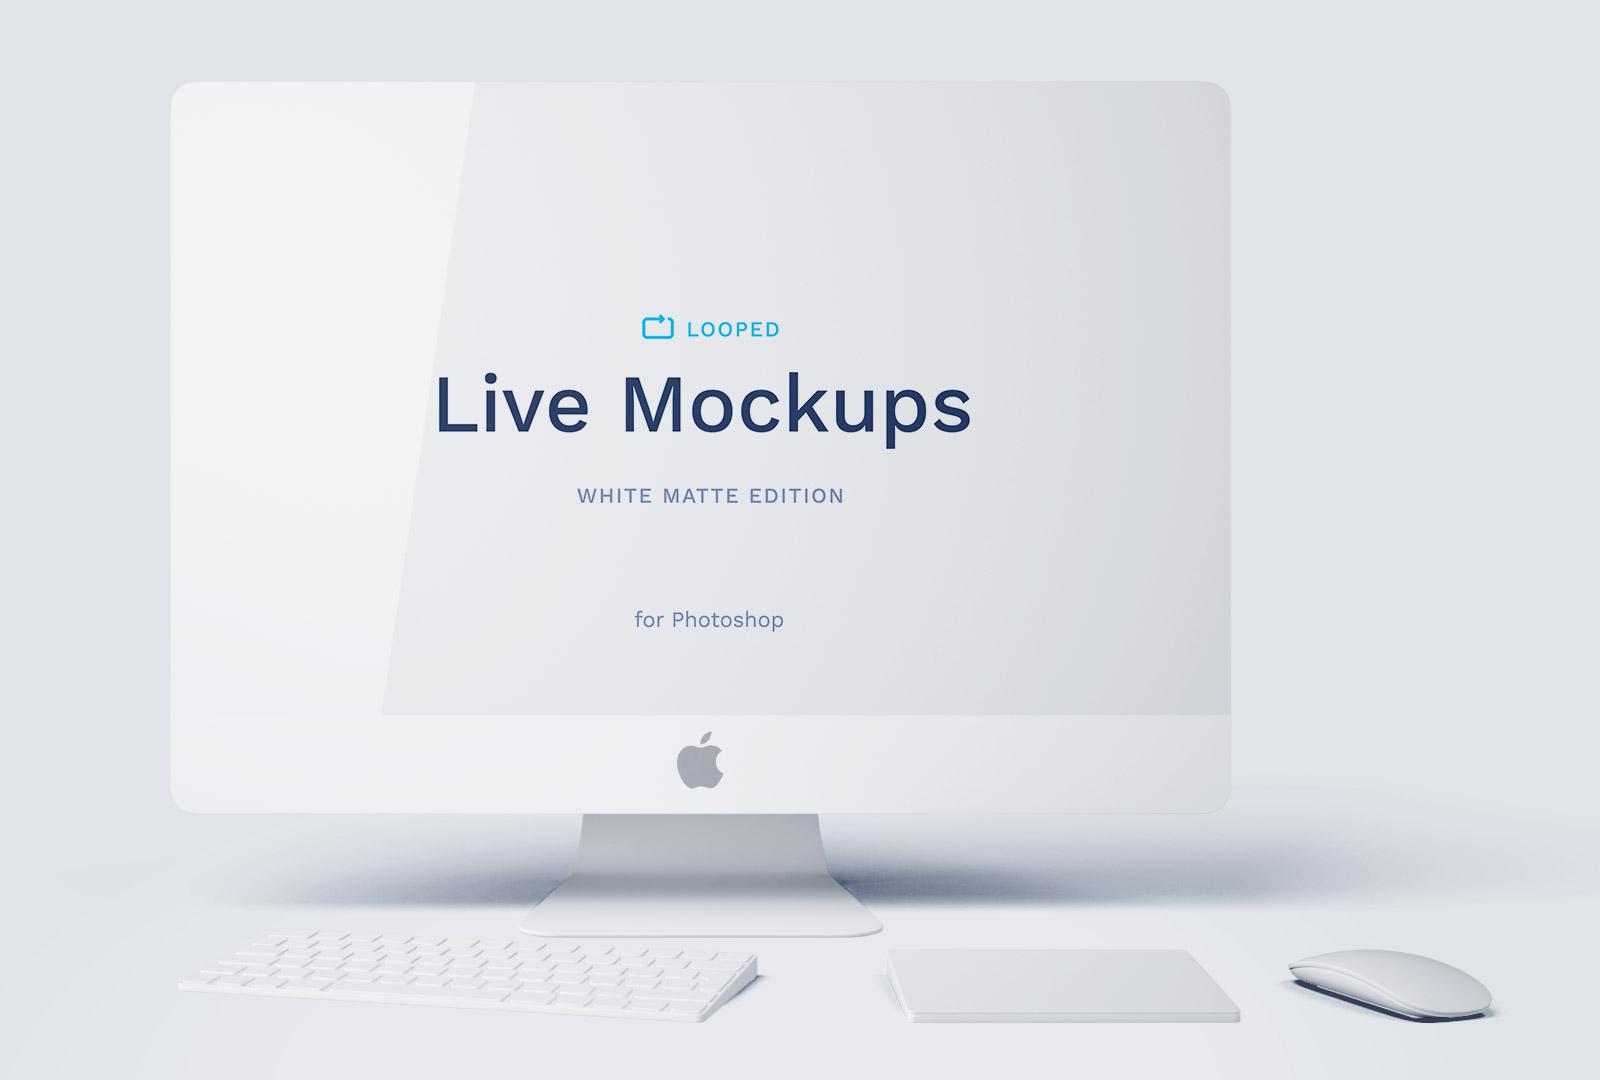 Free White iMac Mockup PSD